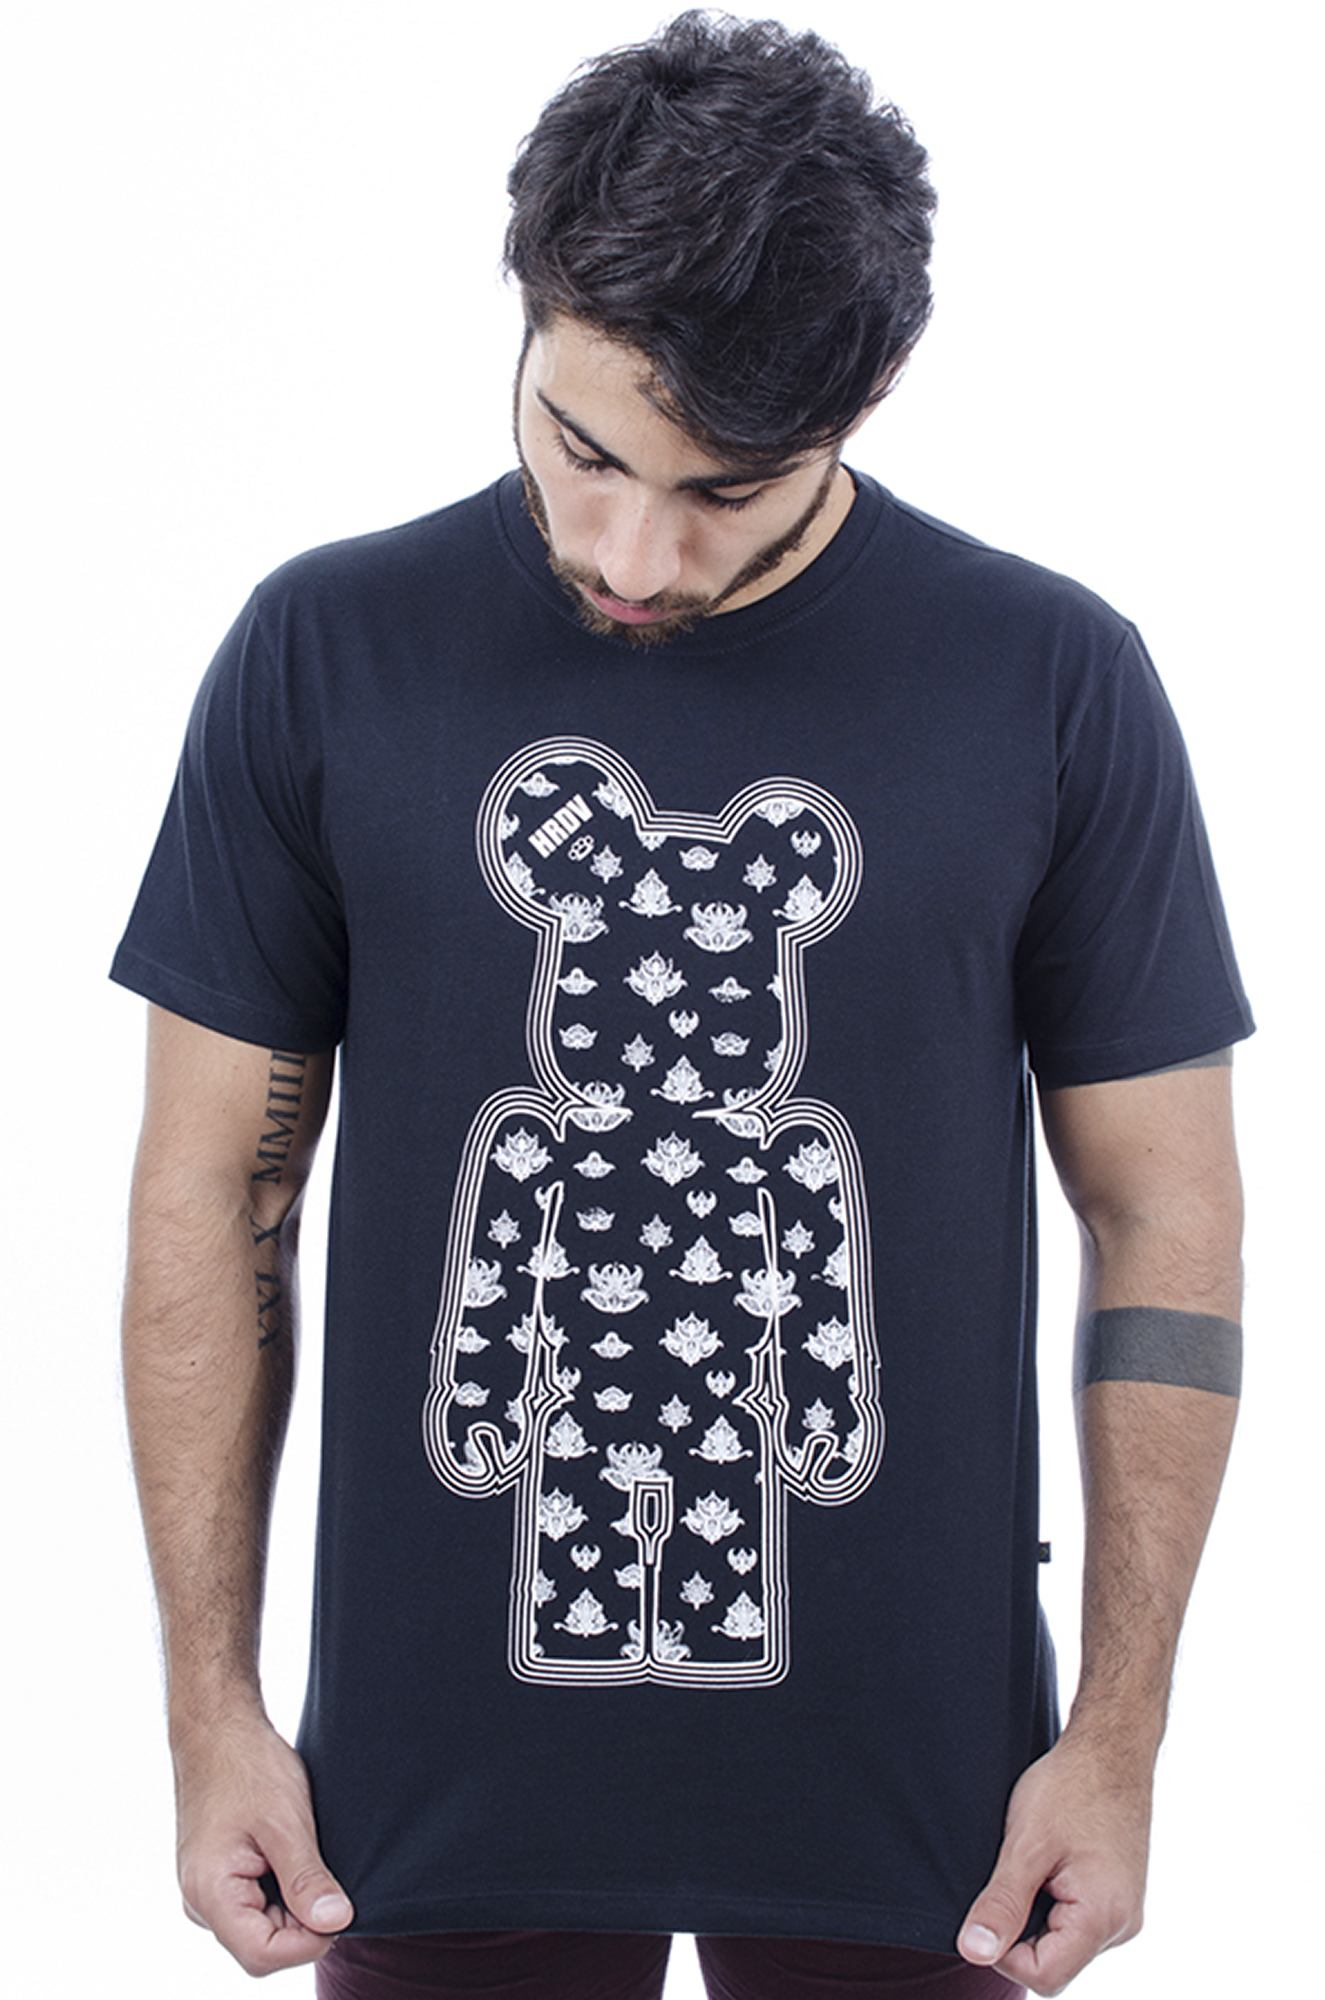 Camiseta Masculina Estampada Indian Toy Art Preto Hardivision